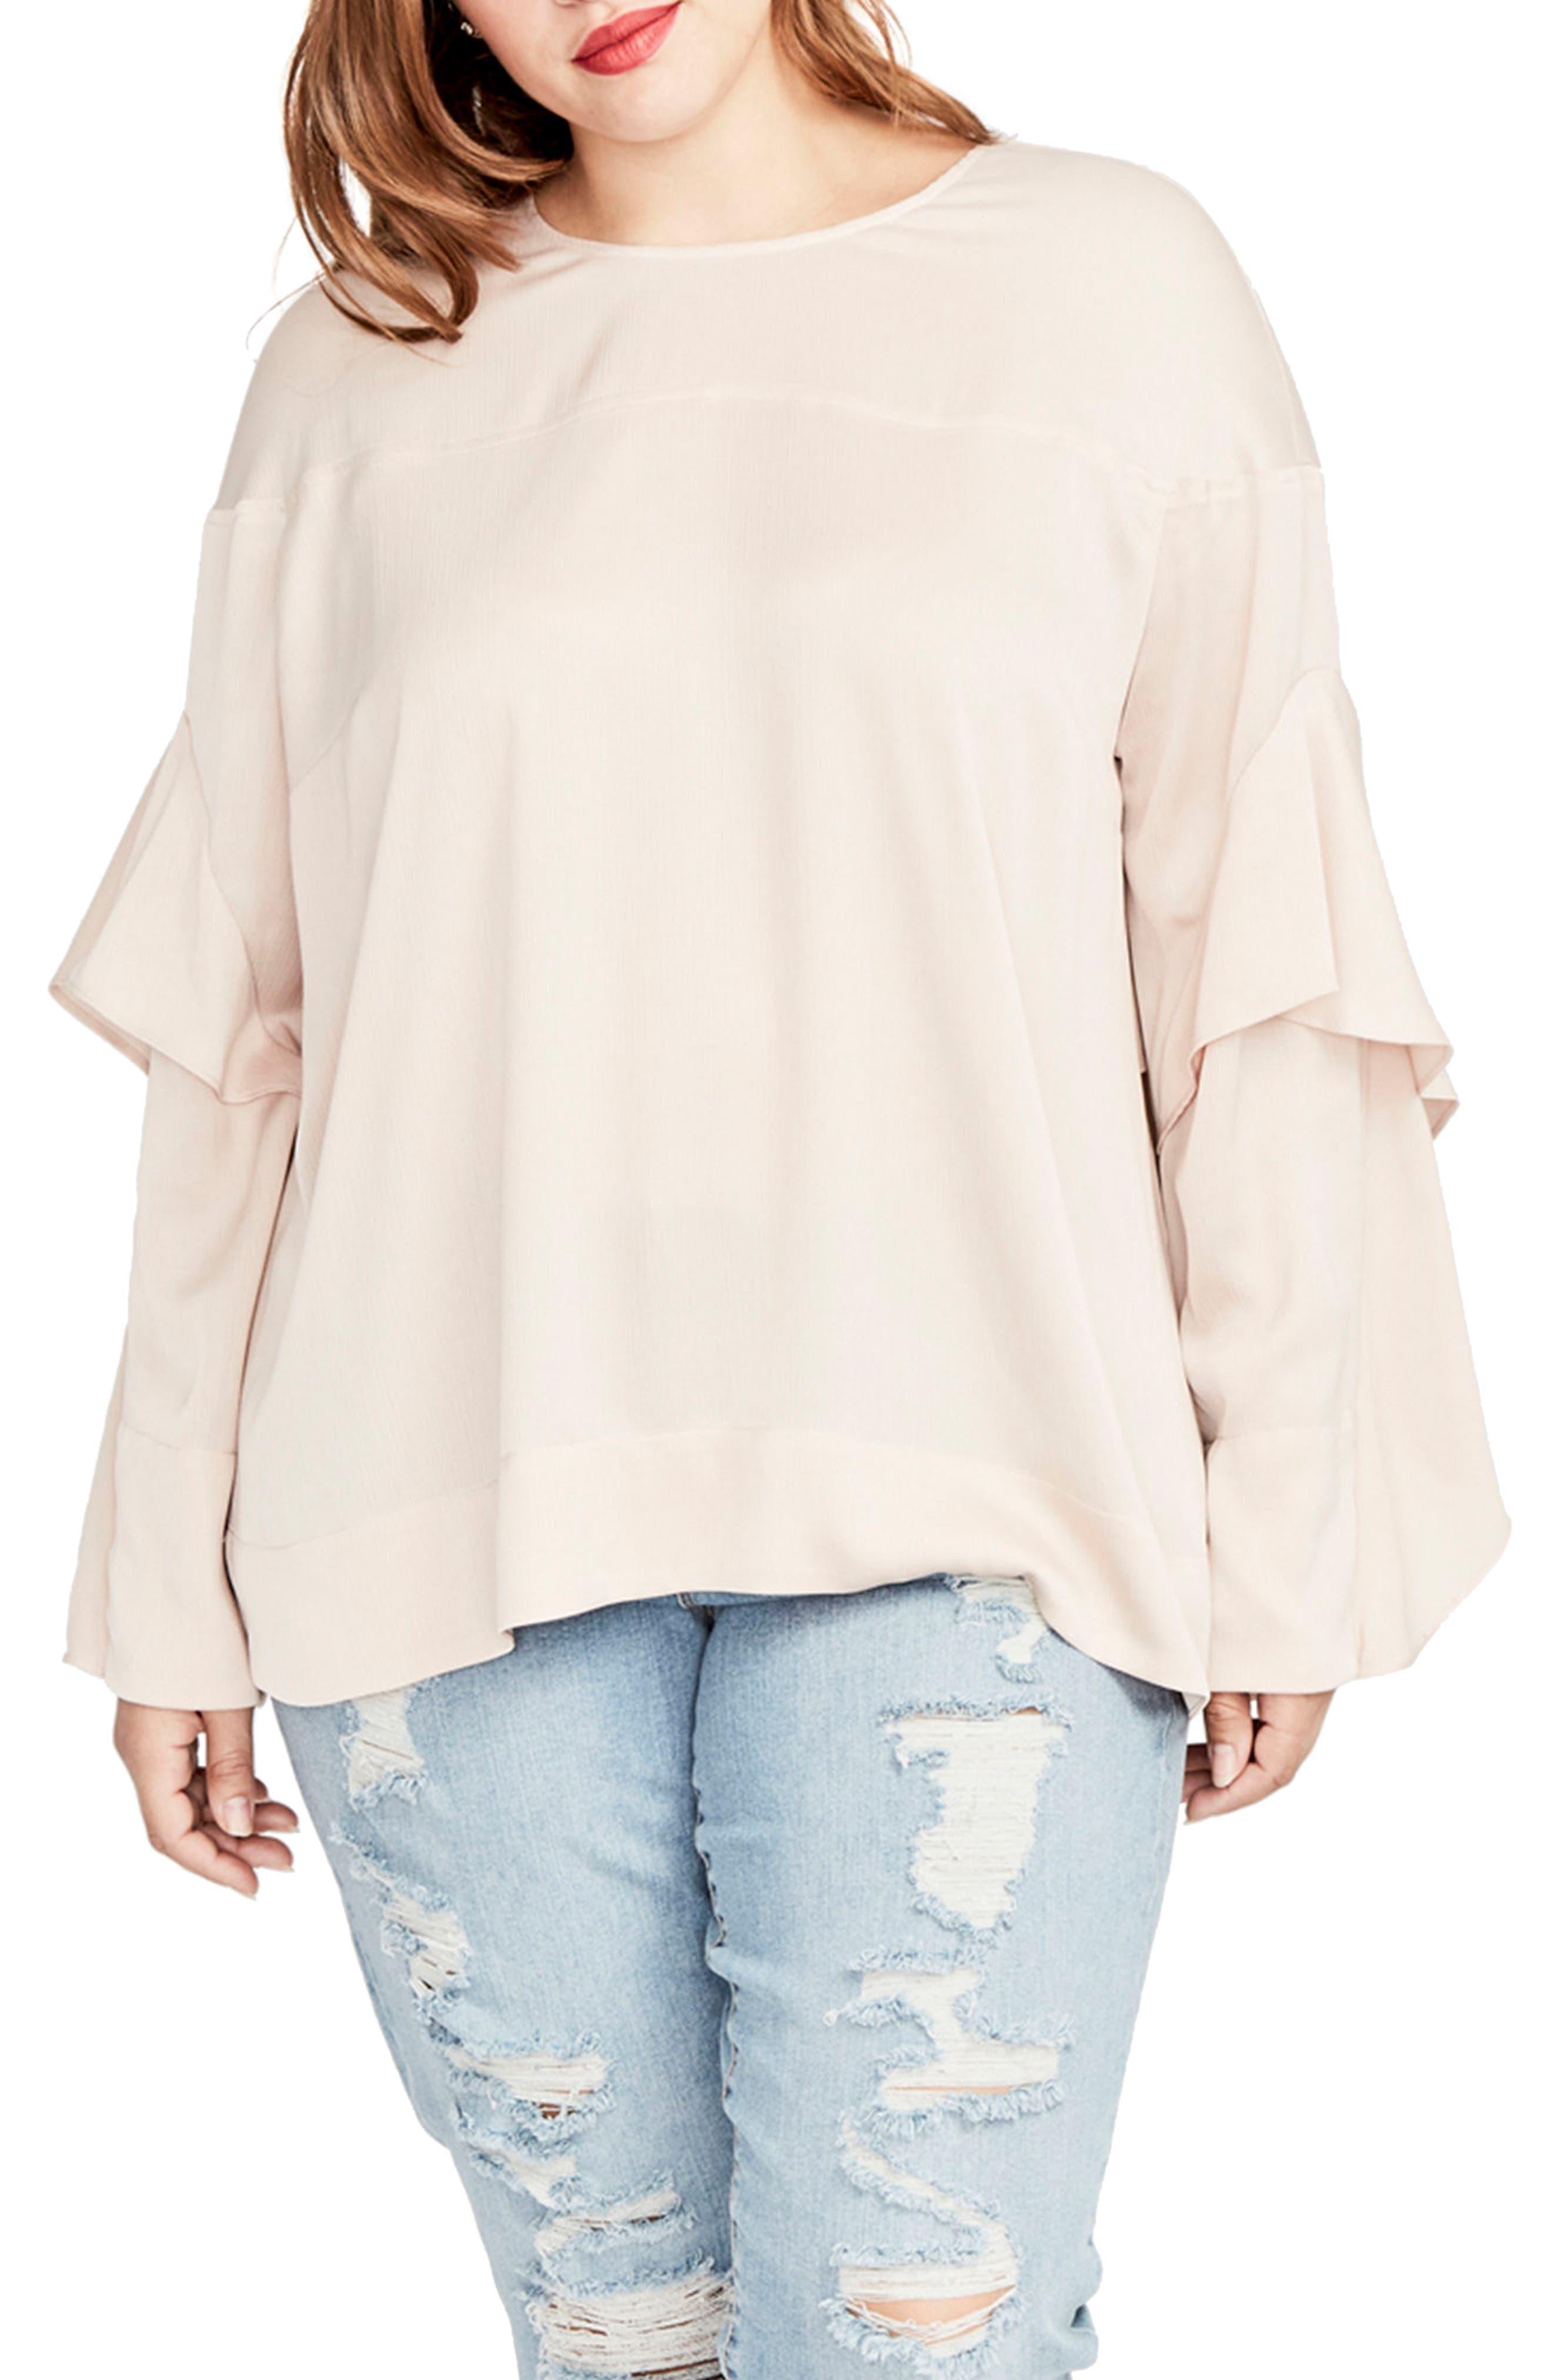 RACHEL Rachel Roy Ruffled Bell Sleeve Blouse (Plus Size)